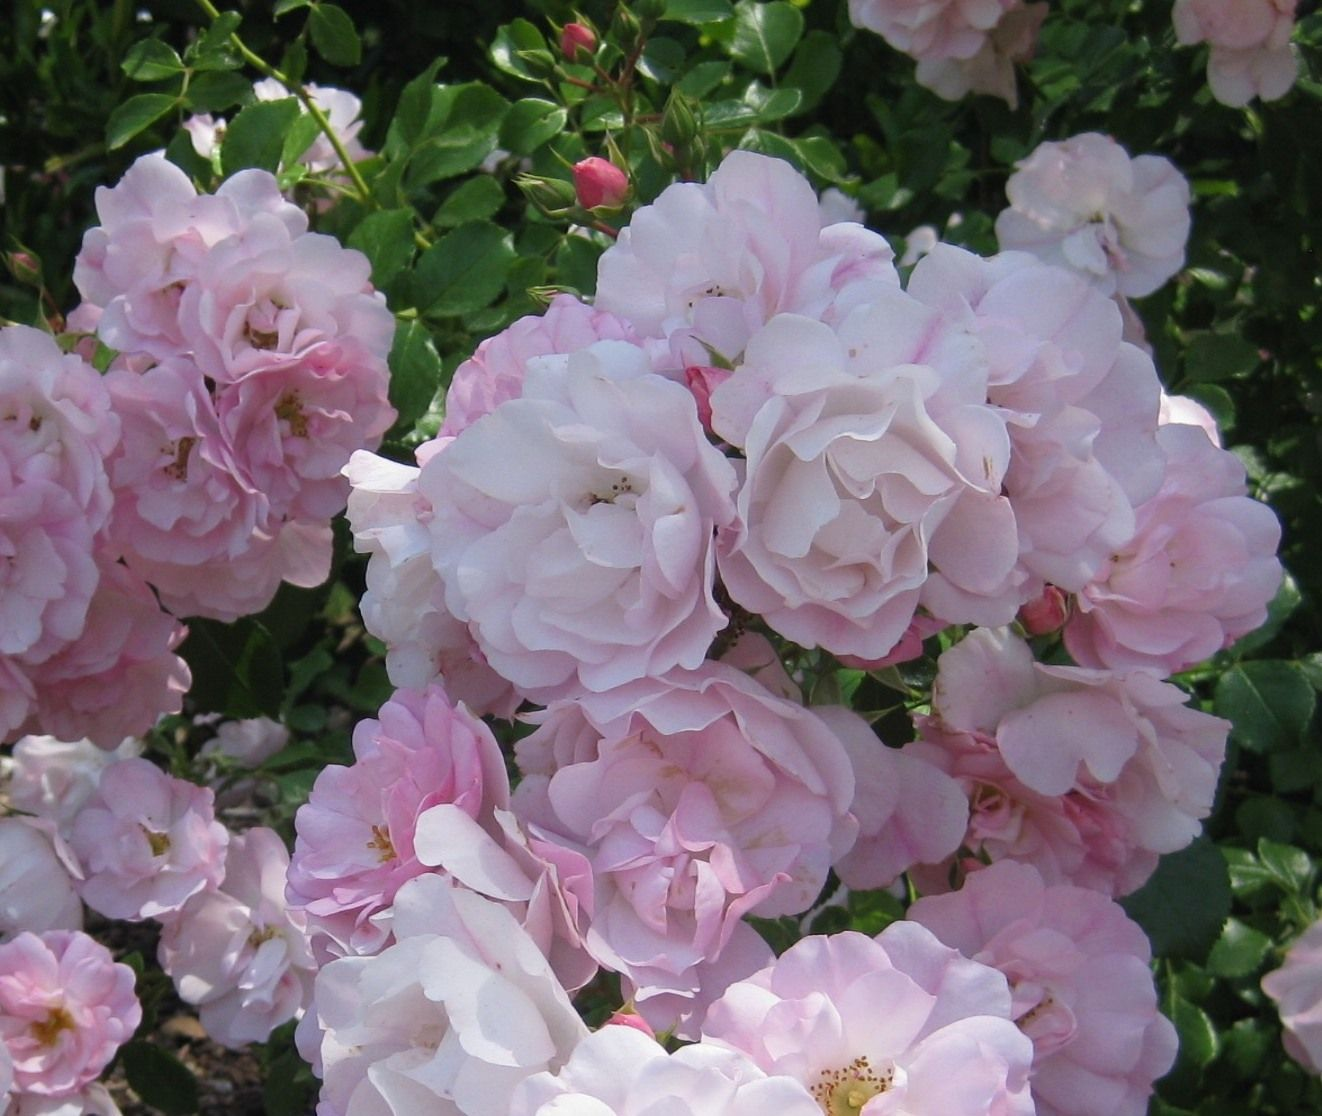 Fiori Tappezzanti Per Aiuole flower carpet® appleblossom groundcover rose - monrovia